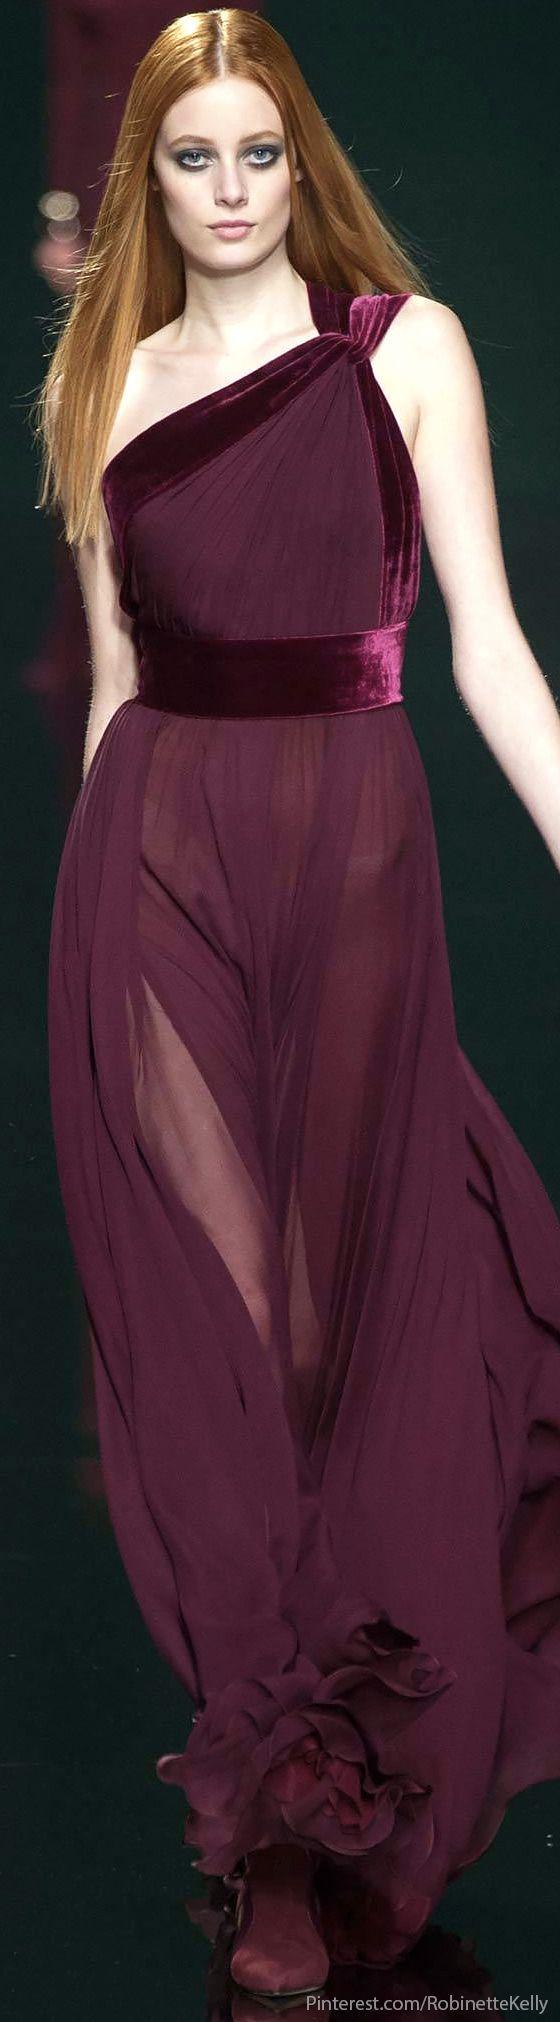 Elie Saab | F/W 2014 RTW ~Latest Luxurious Women's Fashion - Haute Couture - dresses, jackets. bags, jewellery, shoes etc ~ DK